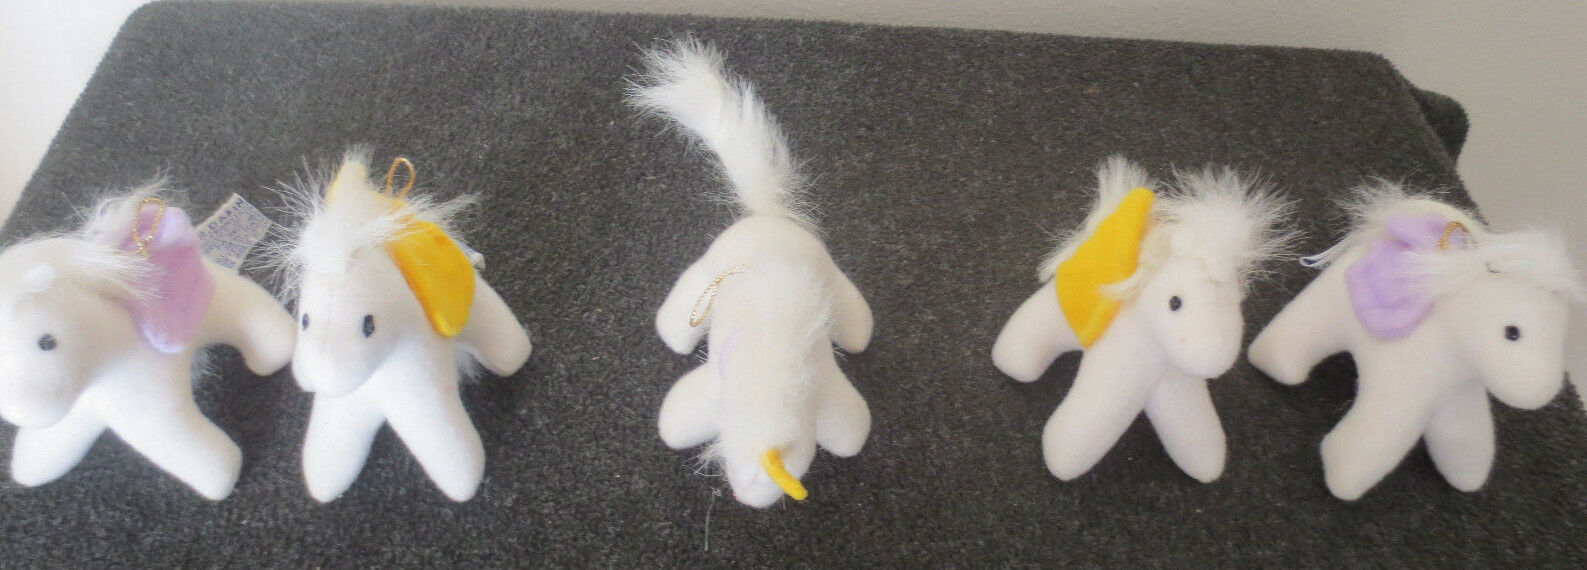 Lot of 5 1982 Dakin Plush Stuffed Toy Ornaments,  Pegasus & One Unicorn   3 1/2